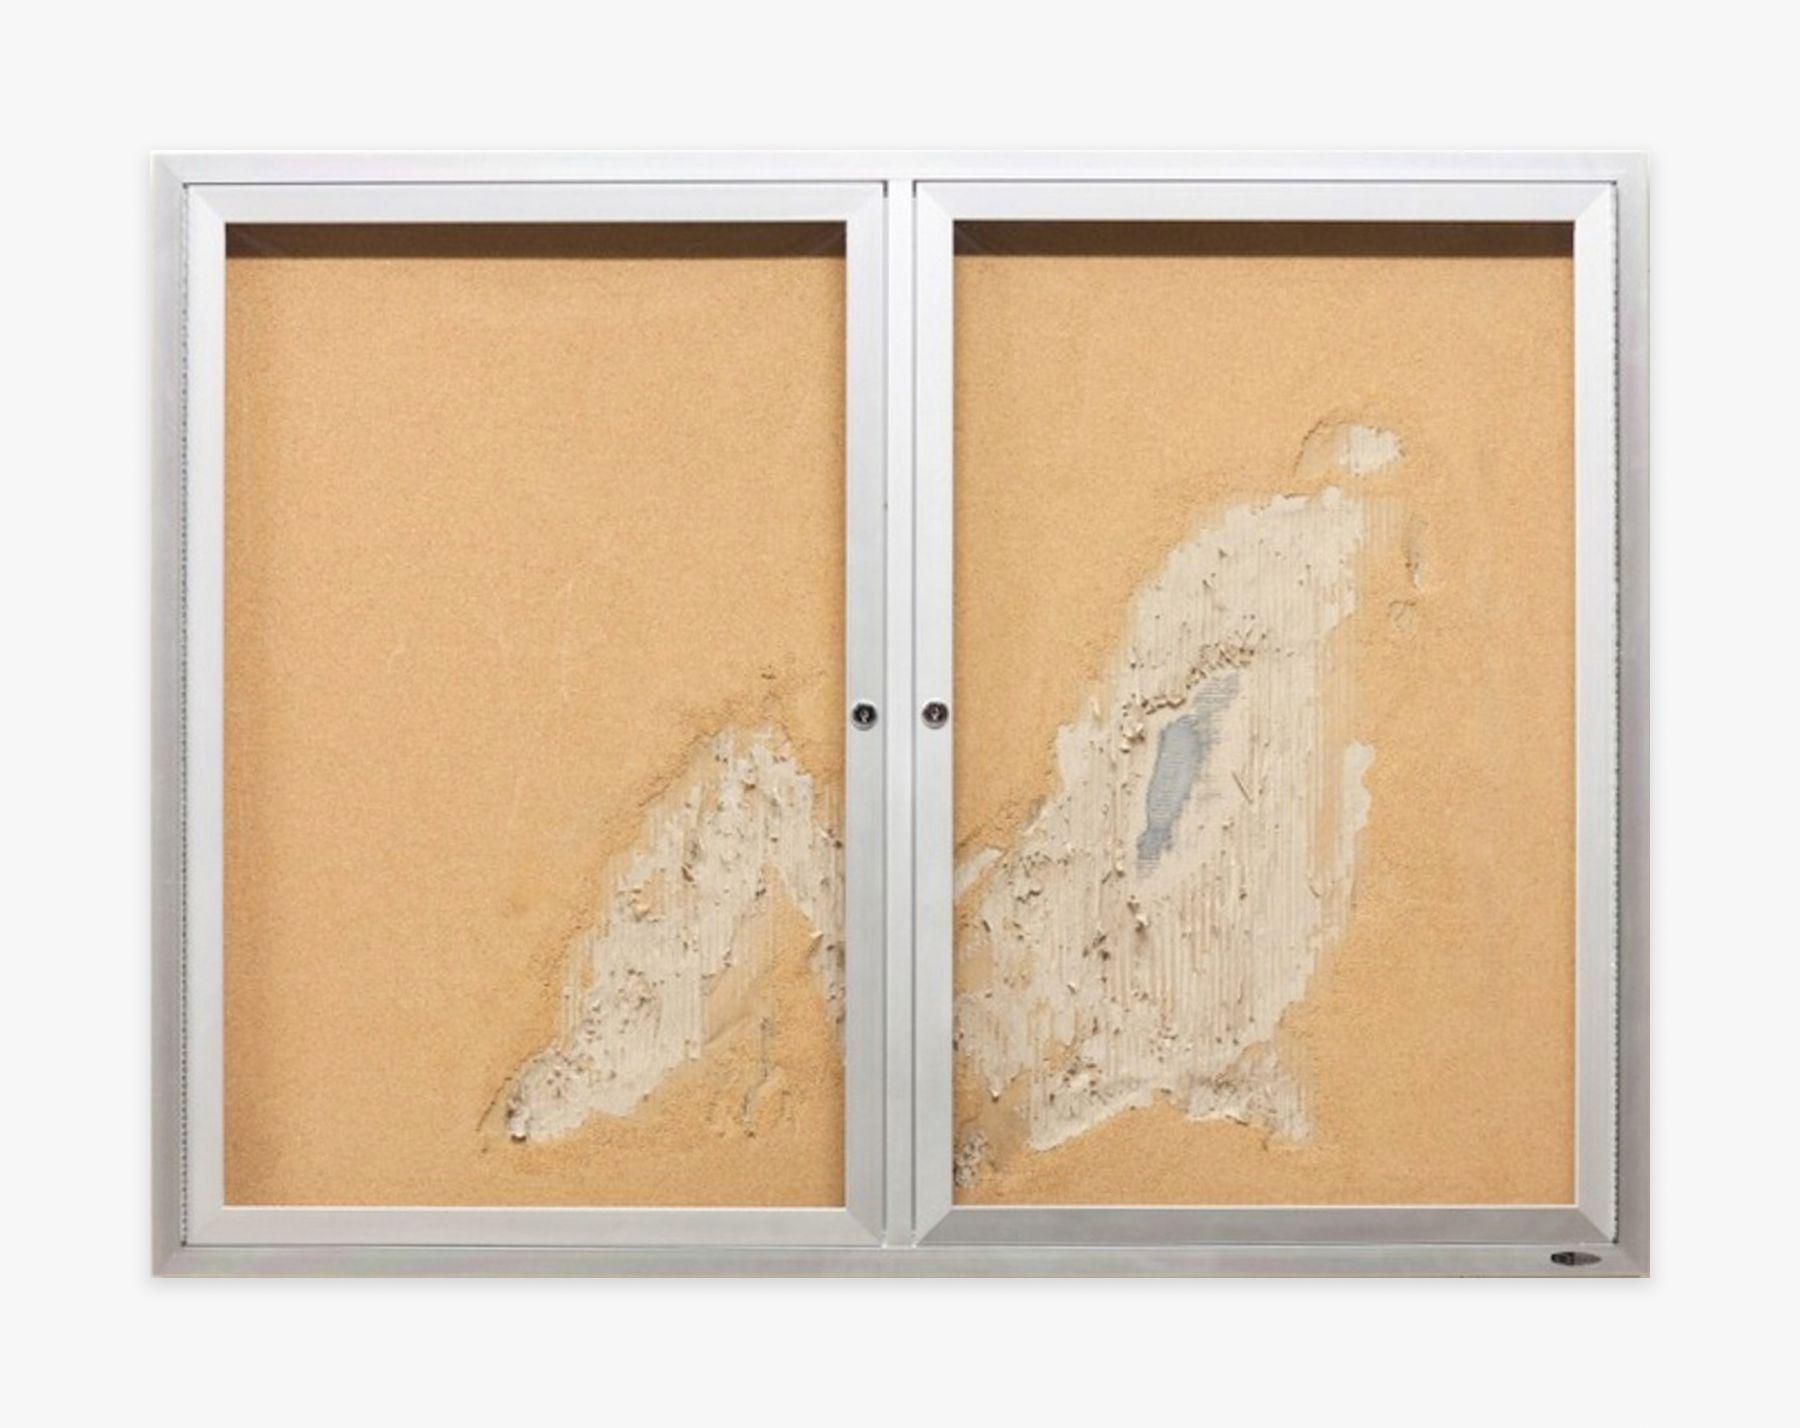 Daniel Turner Untitled (7/11/12)